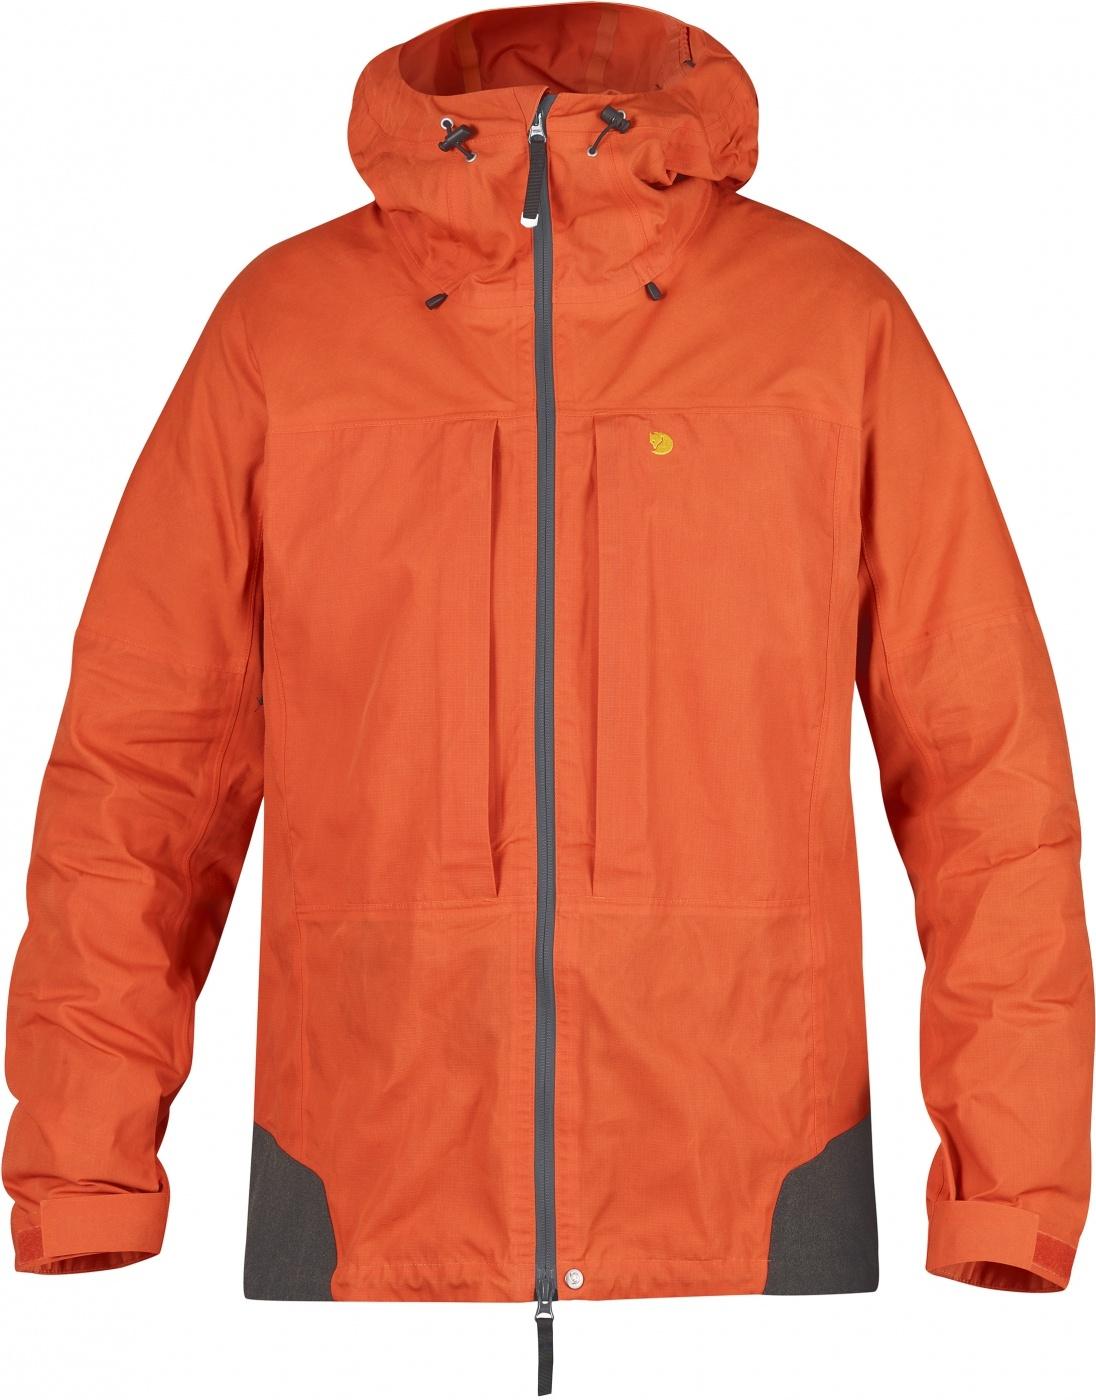 FjallRaven Bergtagen Jacket Hokkaido Orange-30